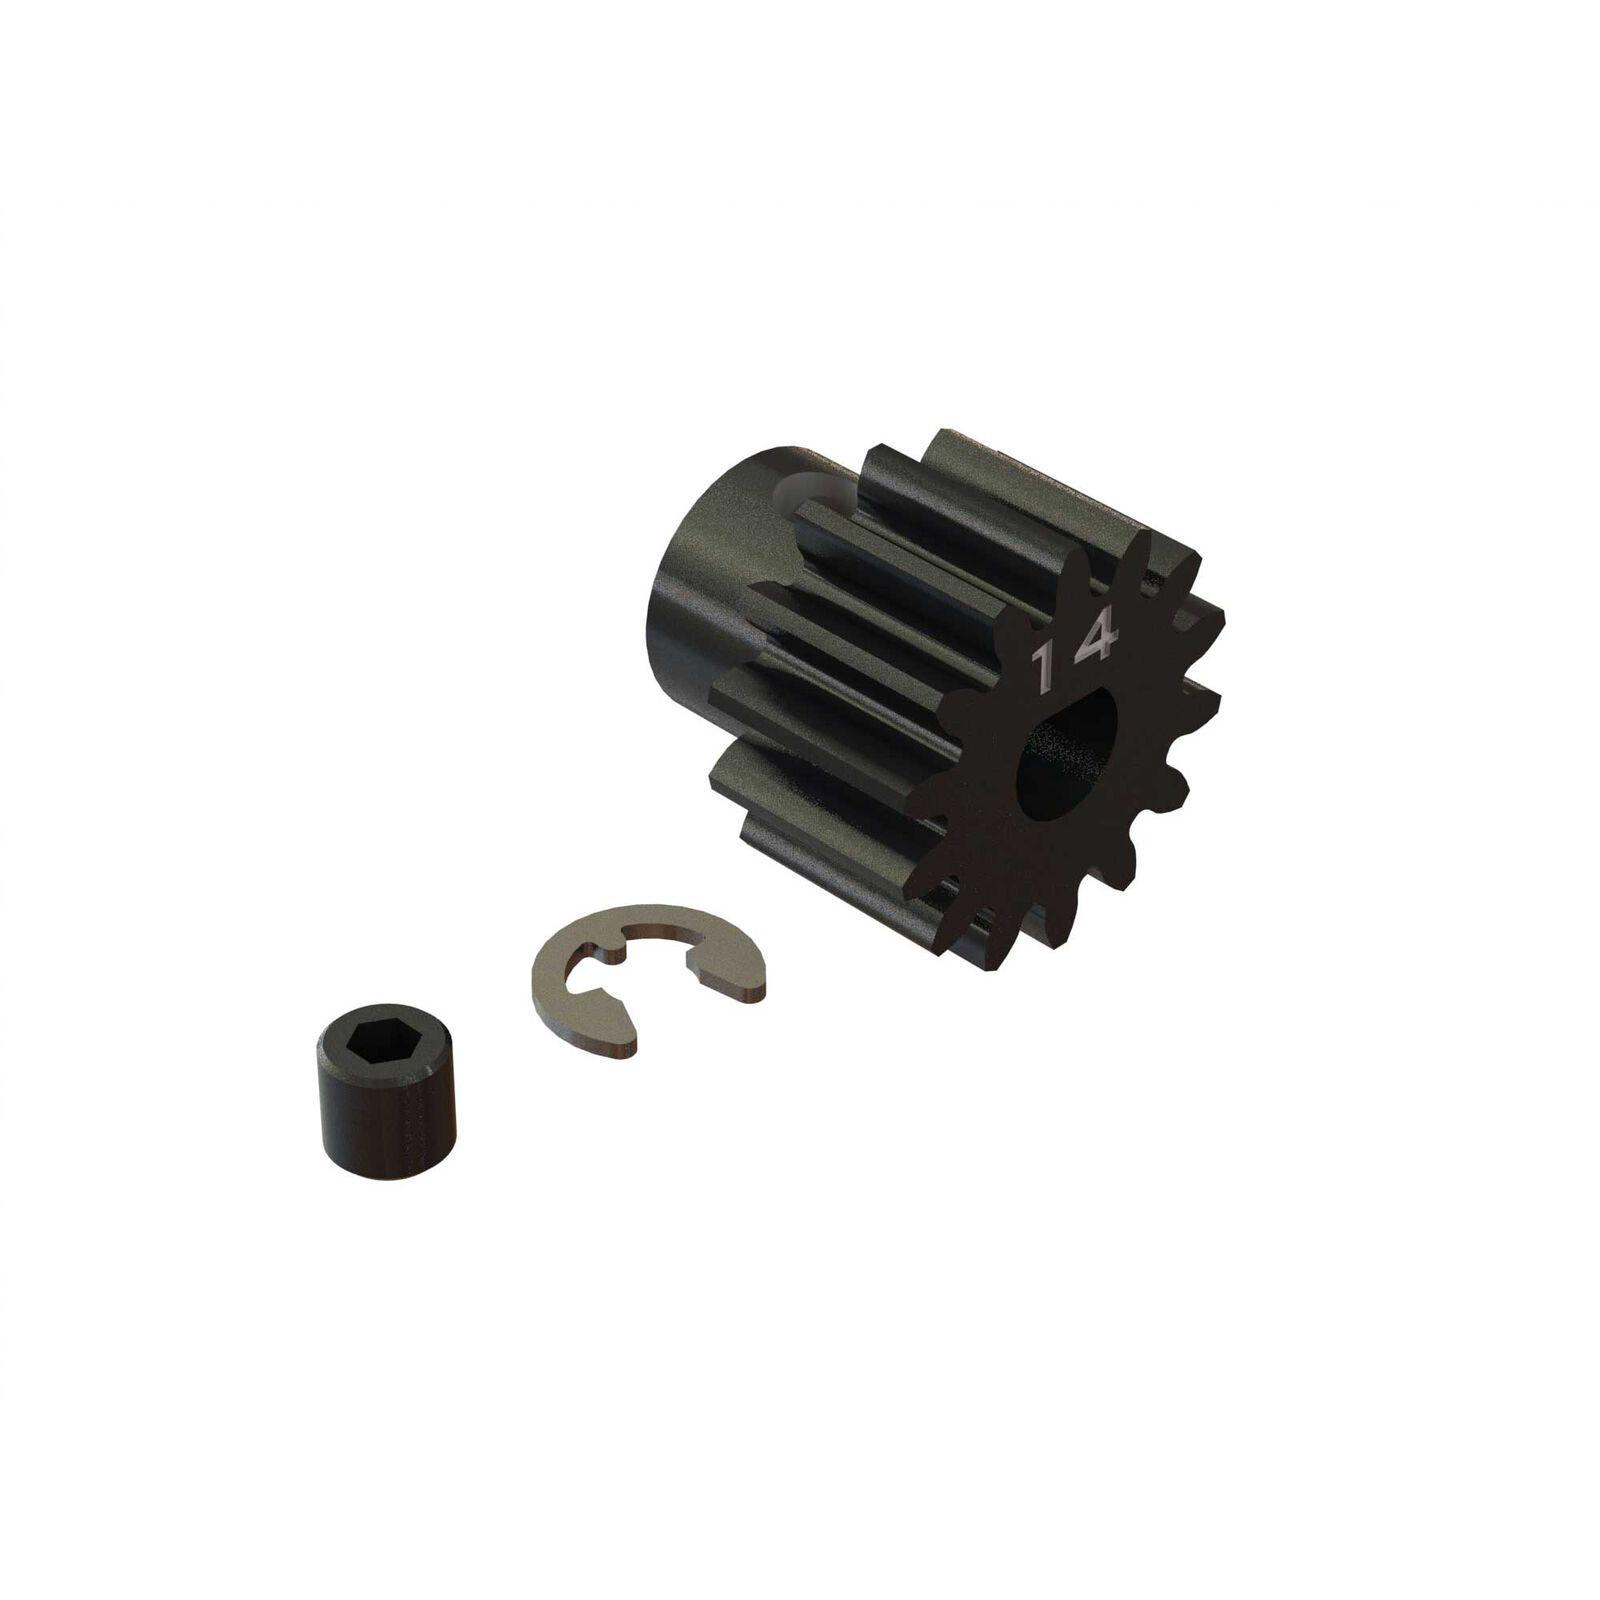 Pinion Gear, 14T HD Mod1 Safe-D5